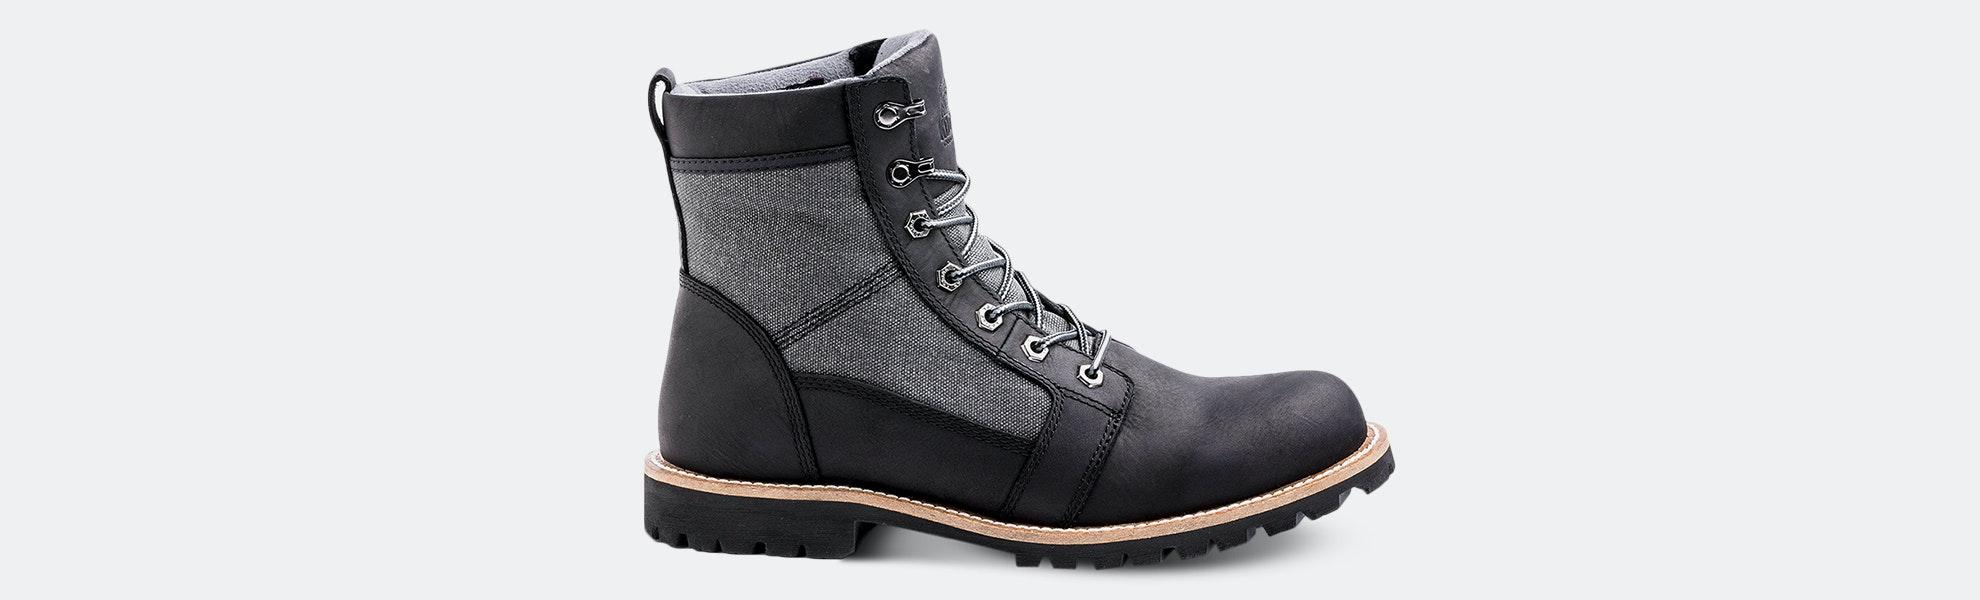 Kodiak Men's Thane Boots